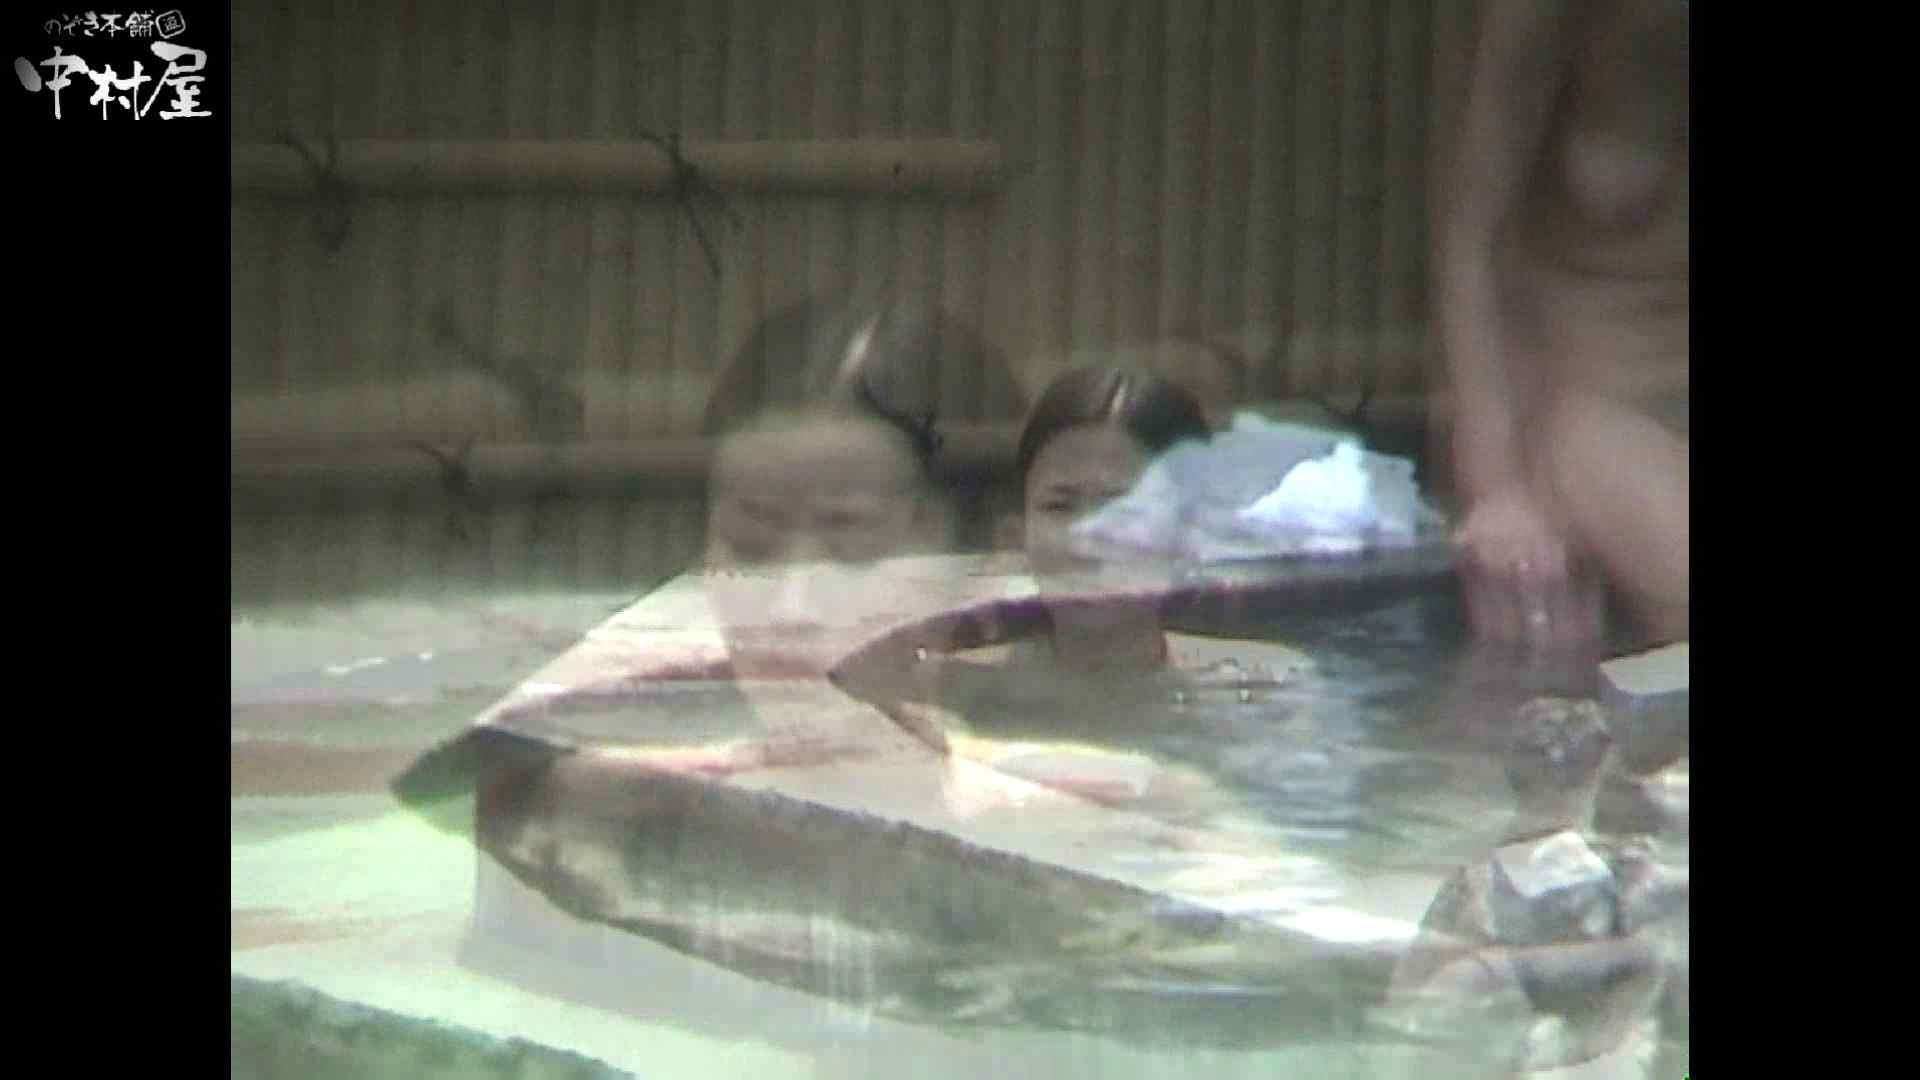 Aquaな露天風呂Vol.934 OLセックス  66画像 3